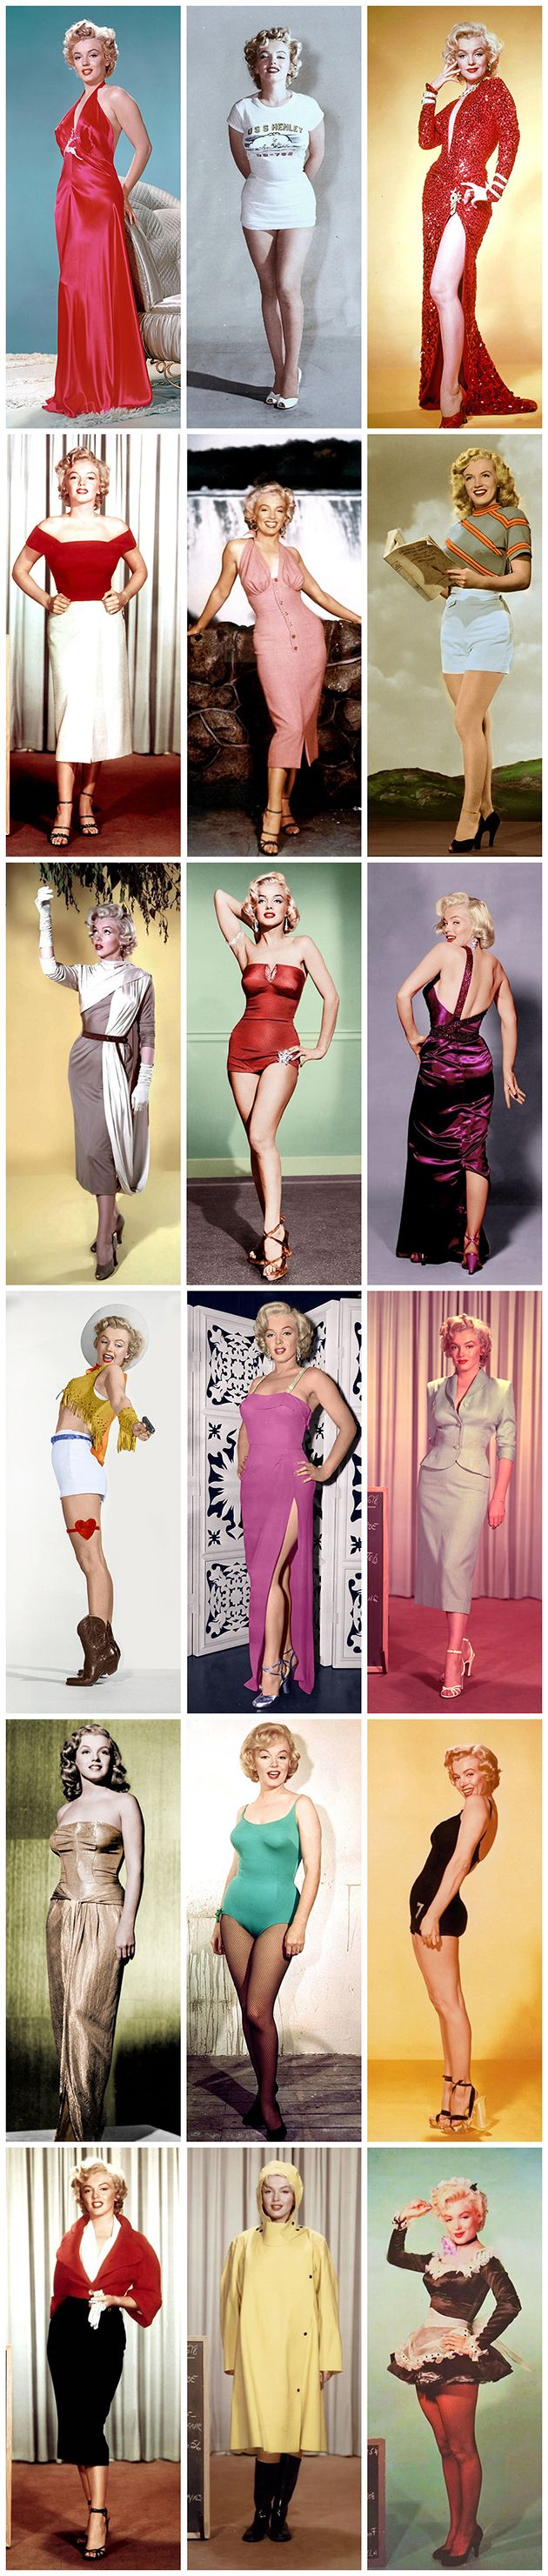 Marilyn Monroe – wardrobe test photographs …. #marilynmonroe #pinup #monroe #normajeane #iconic #sexsymbol #hollywoodlegend #hollywoodactress